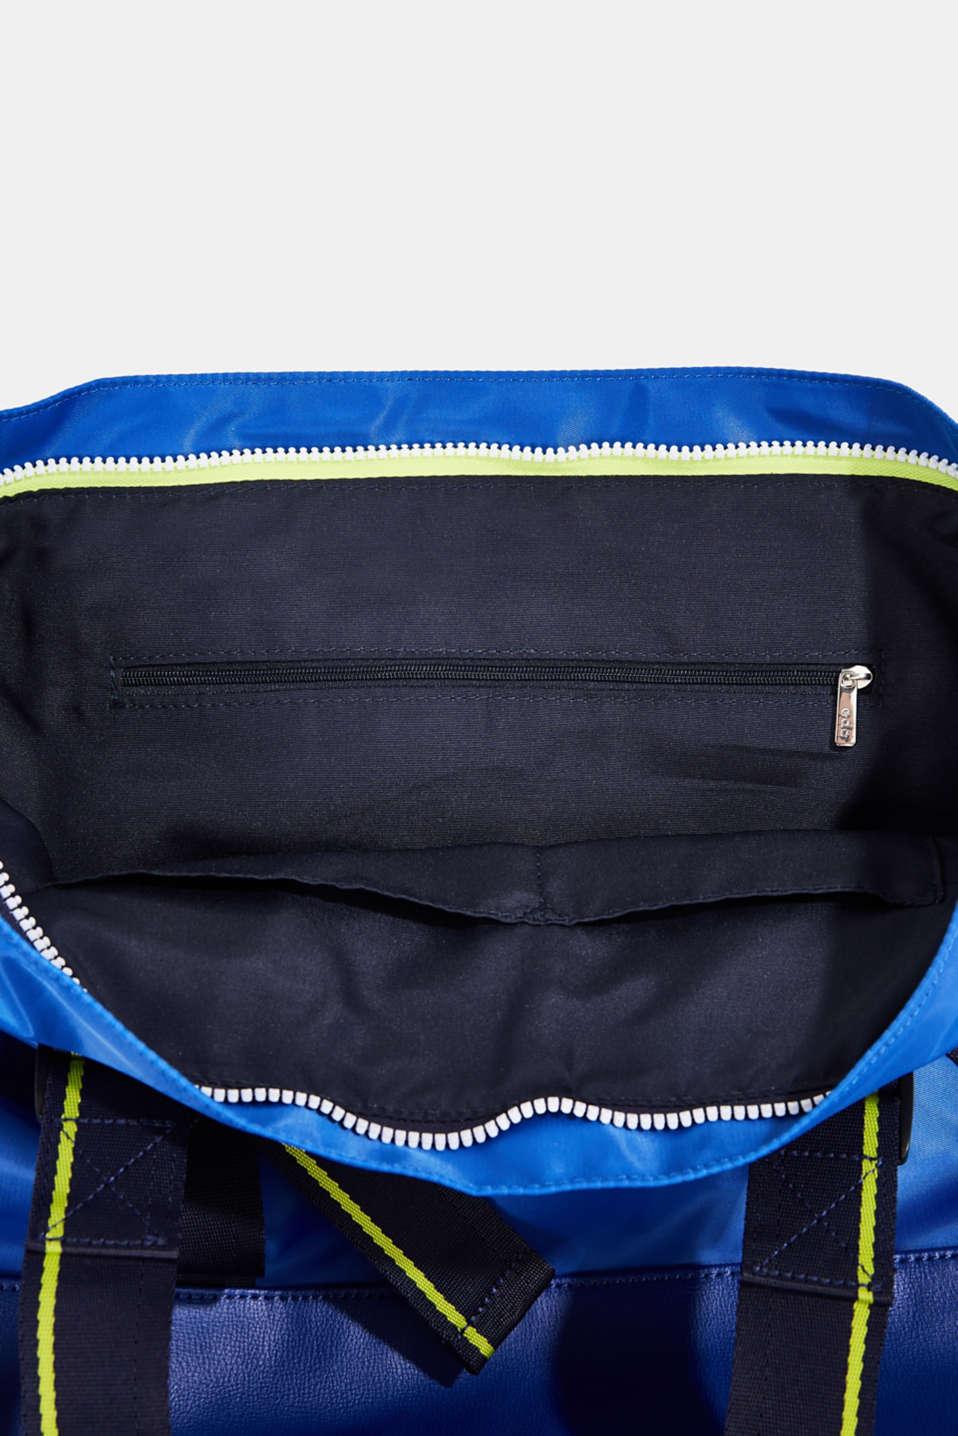 Nylon tote bag, BRIGHT BLUE, detail image number 4